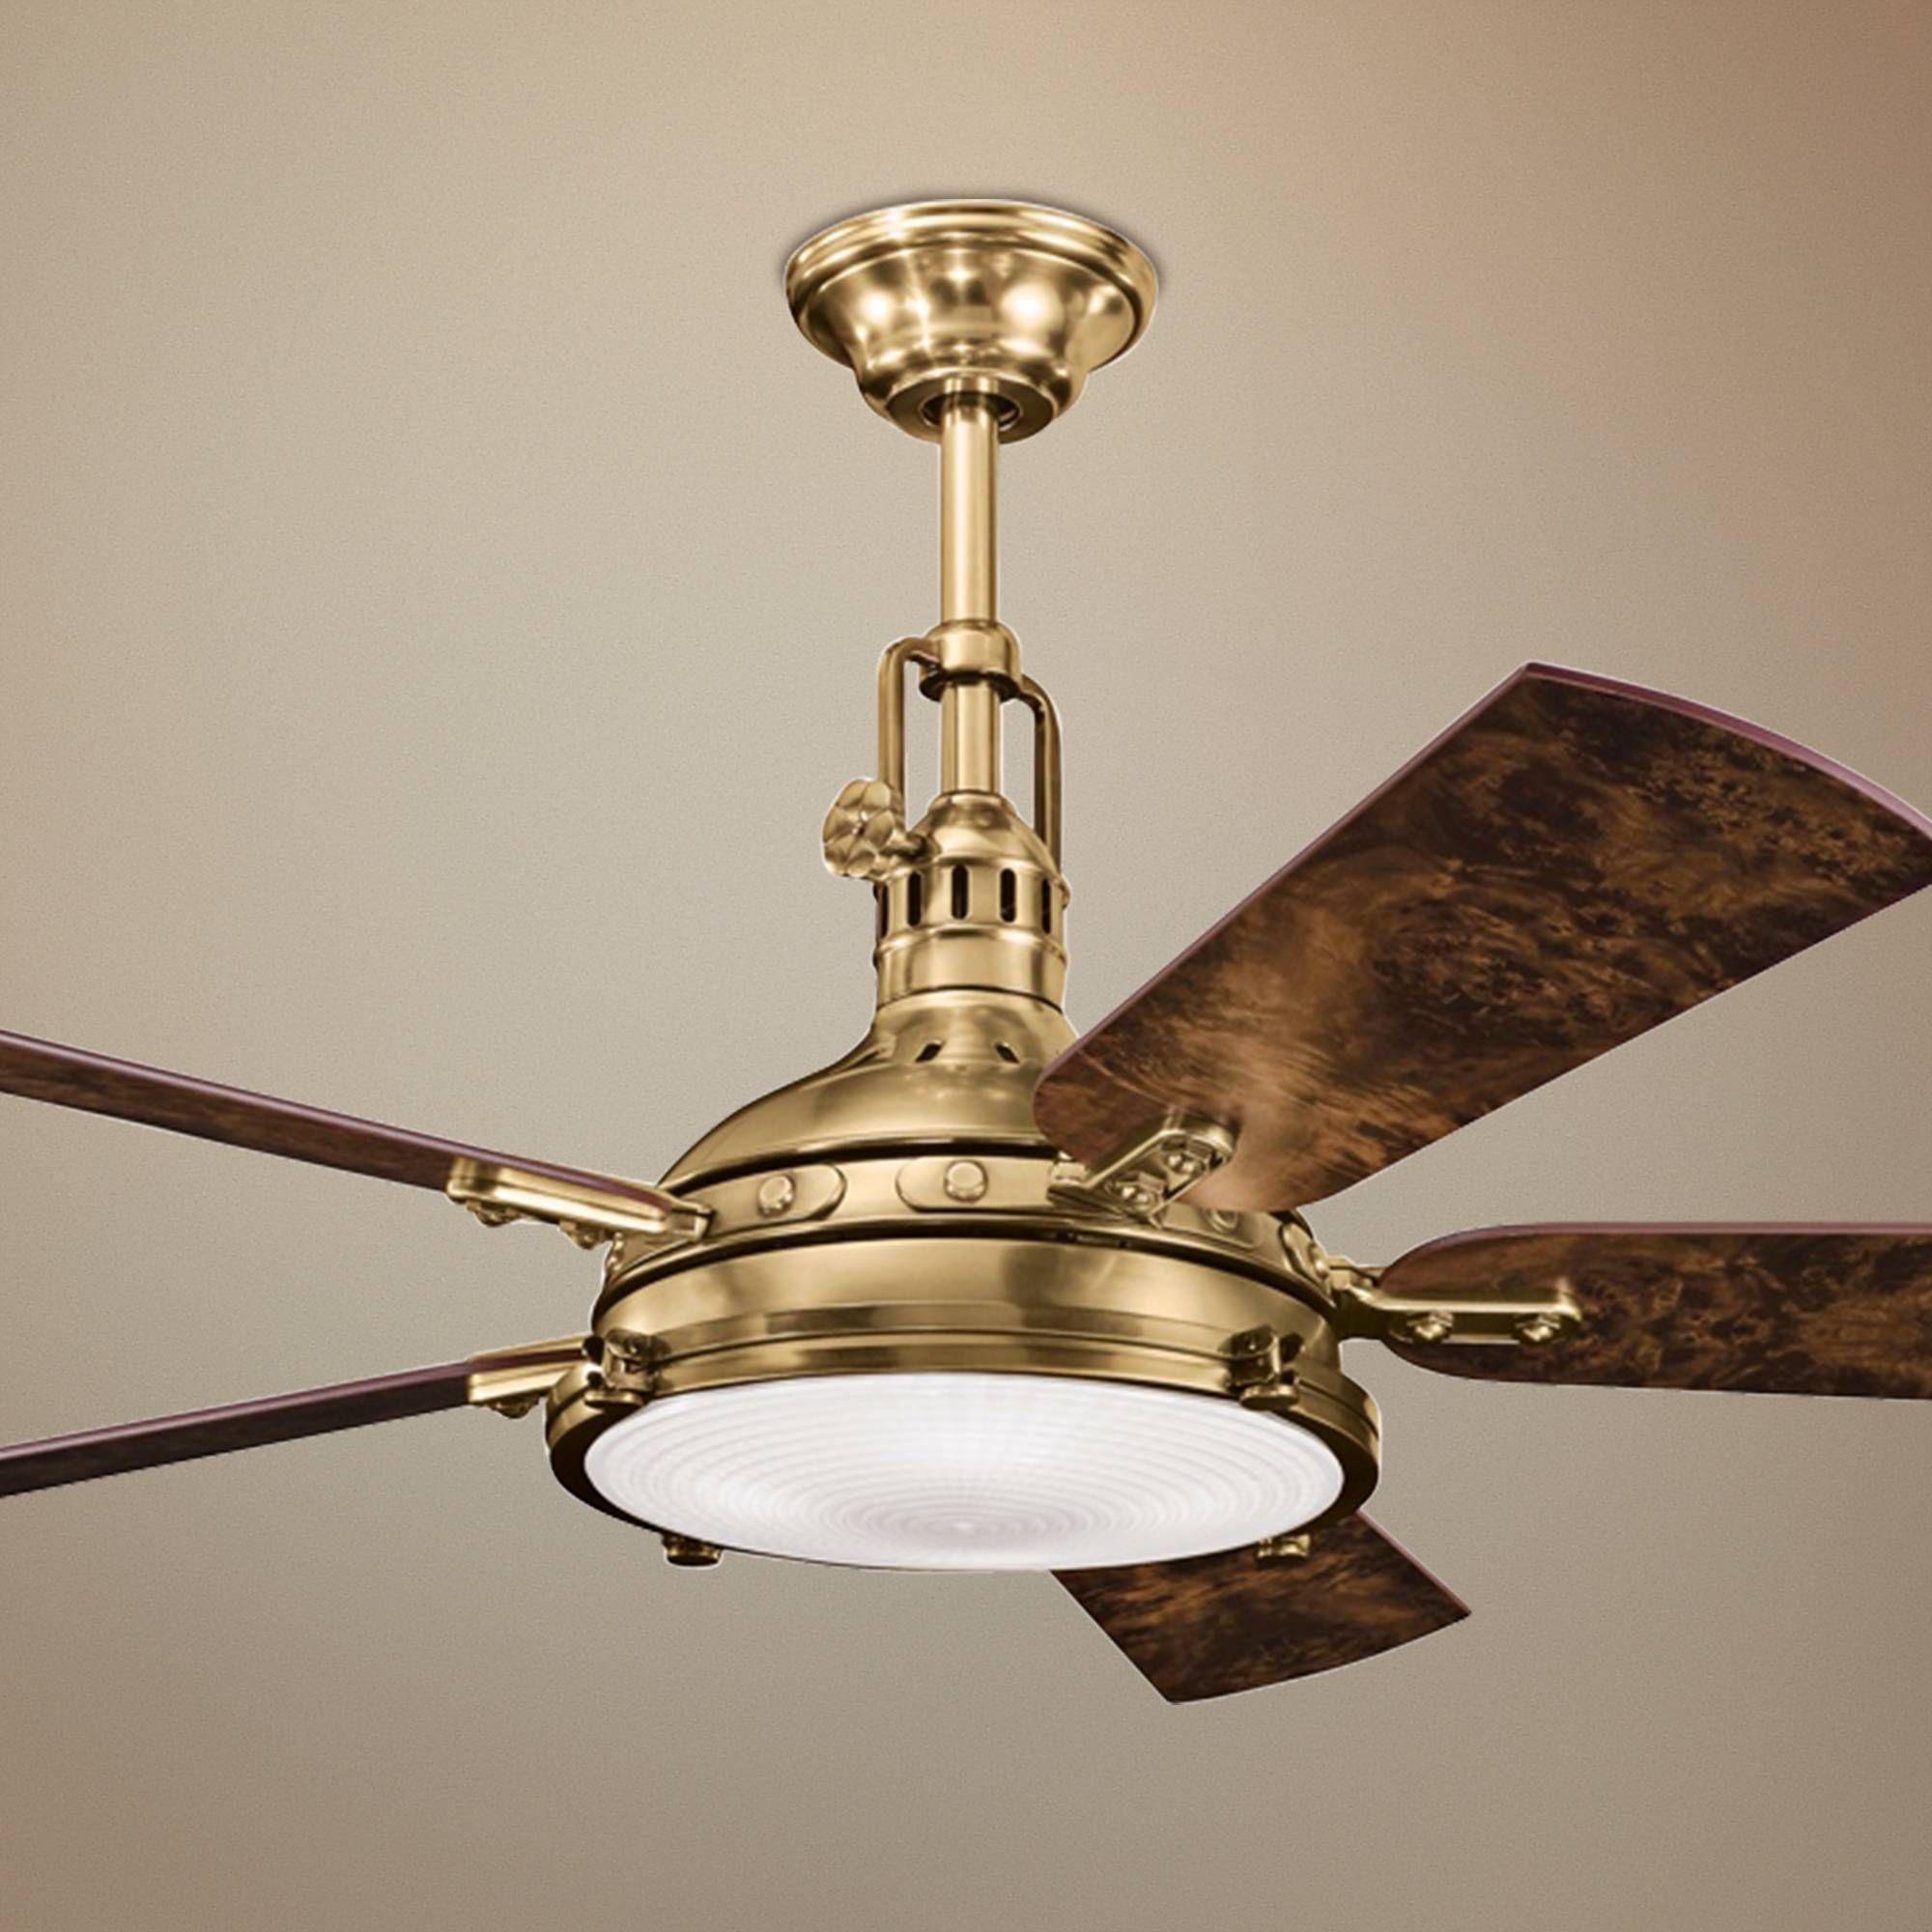 "56"" Kichler Hatteras Bay Burnished Antique Brass Ceiling Fan"